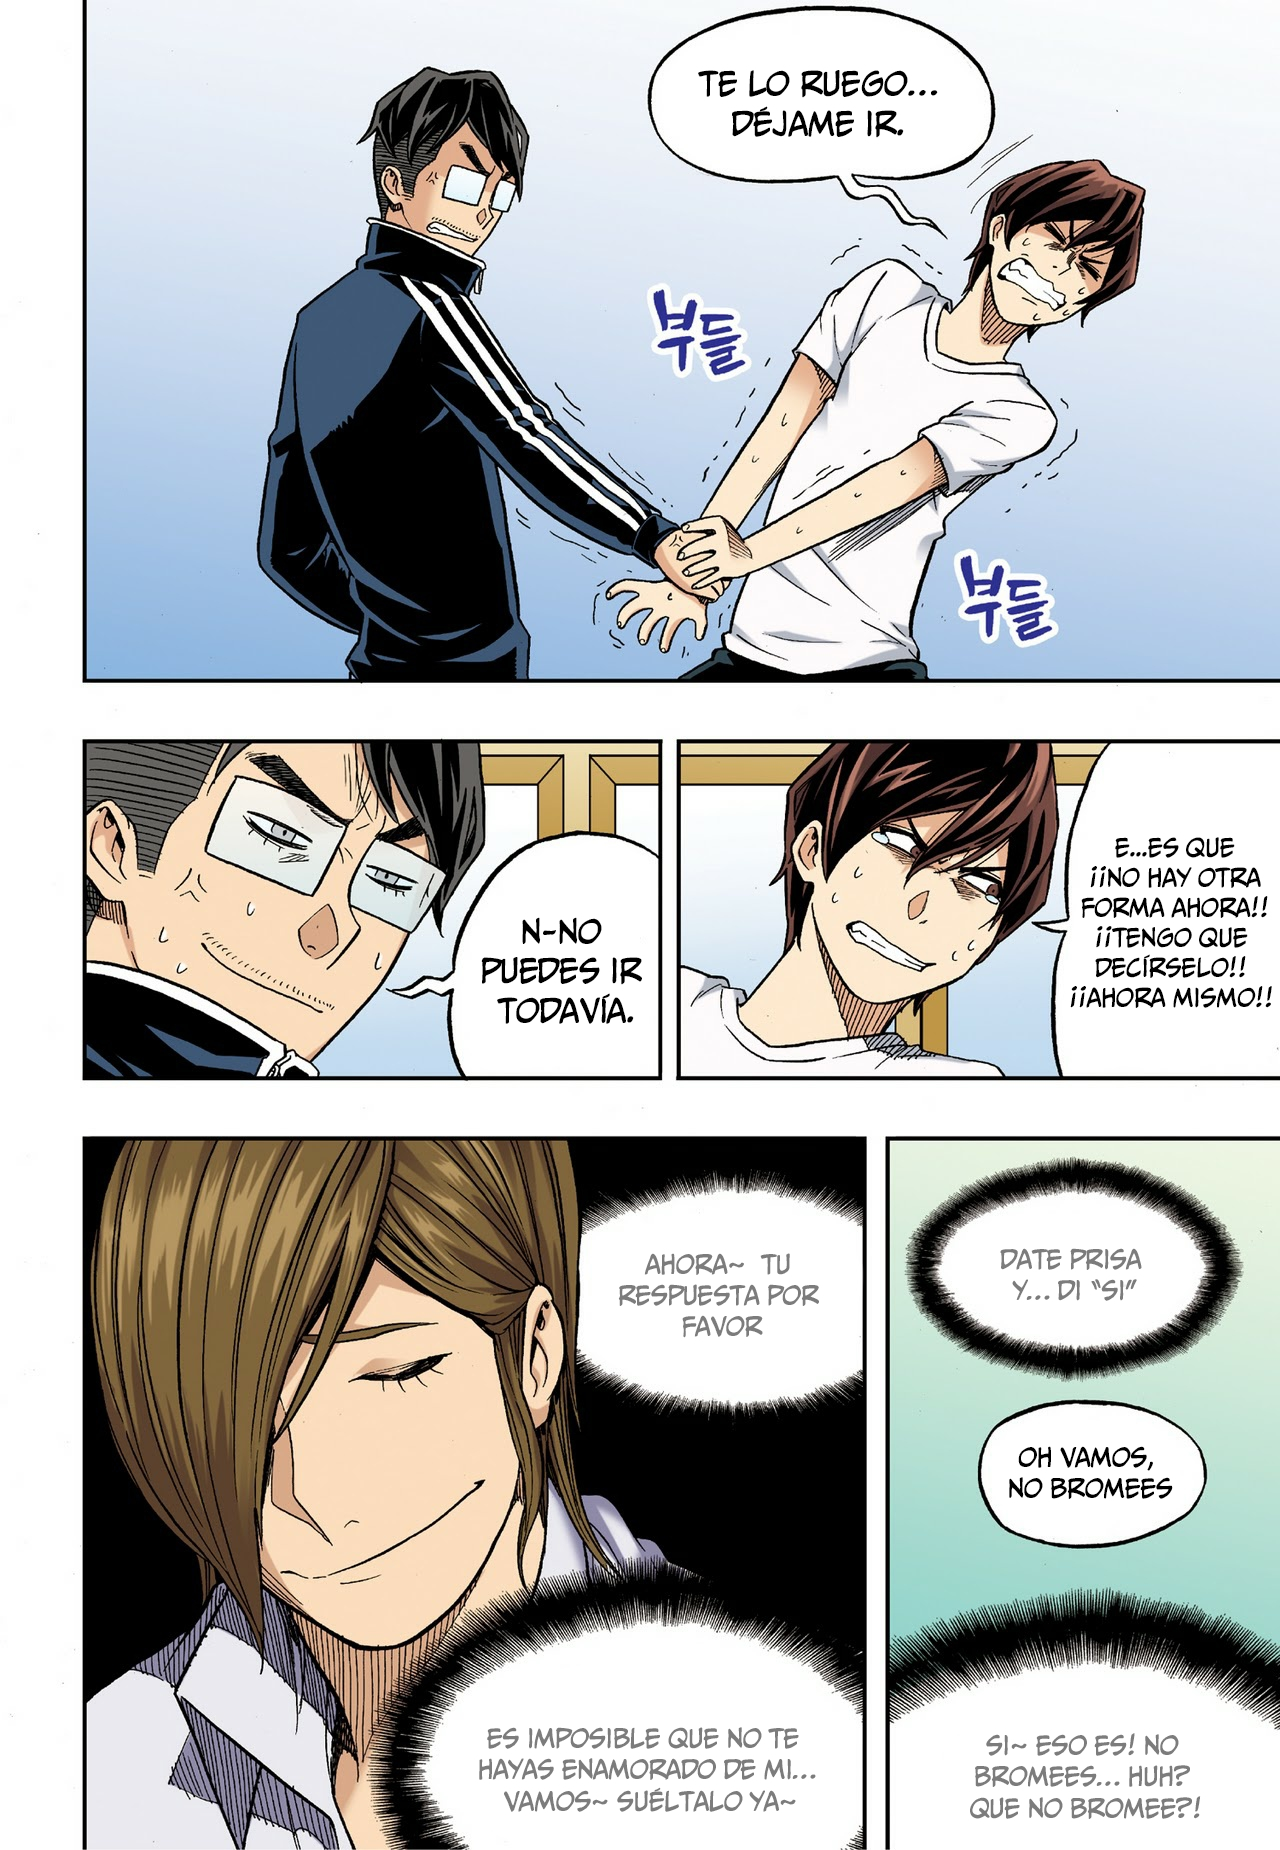 http://c5.ninemanga.com/es_manga/11/14923/418292/e2419742b3eb9add29a83a0a742232f7.jpg Page 6